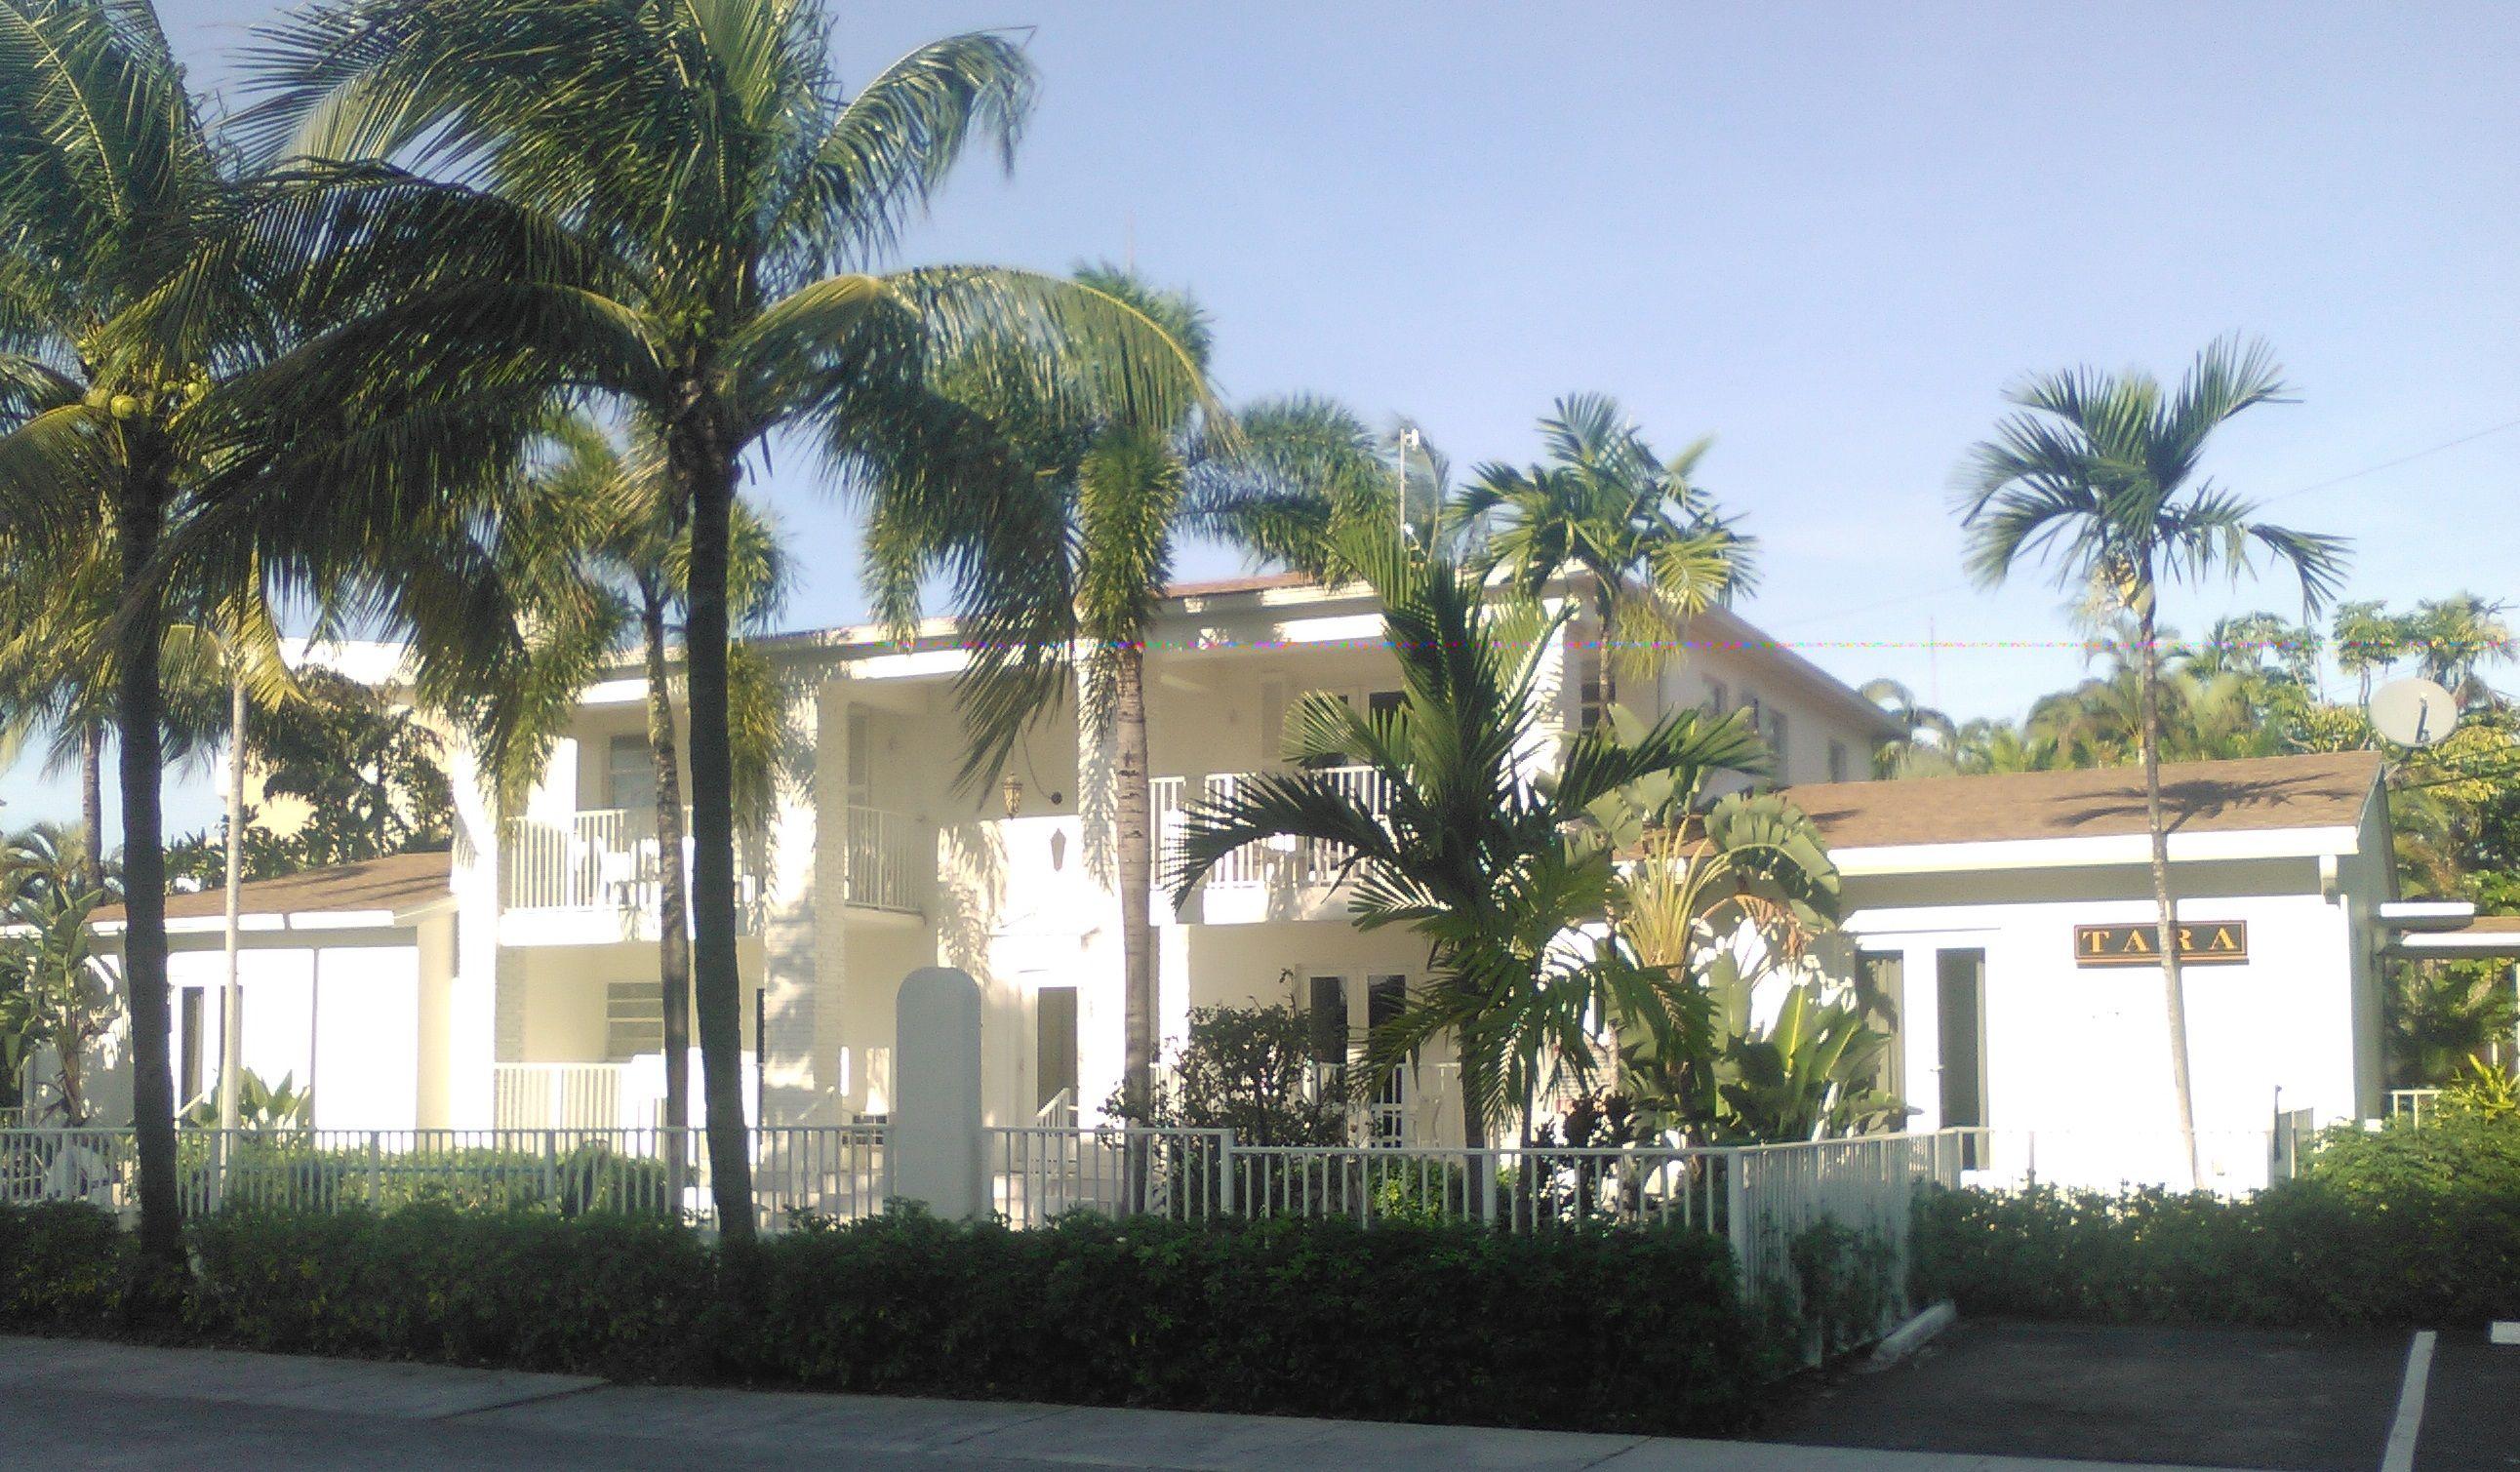 Tara Hotel Fort Lauderdale Beach Http Www Veniceofamericahomes